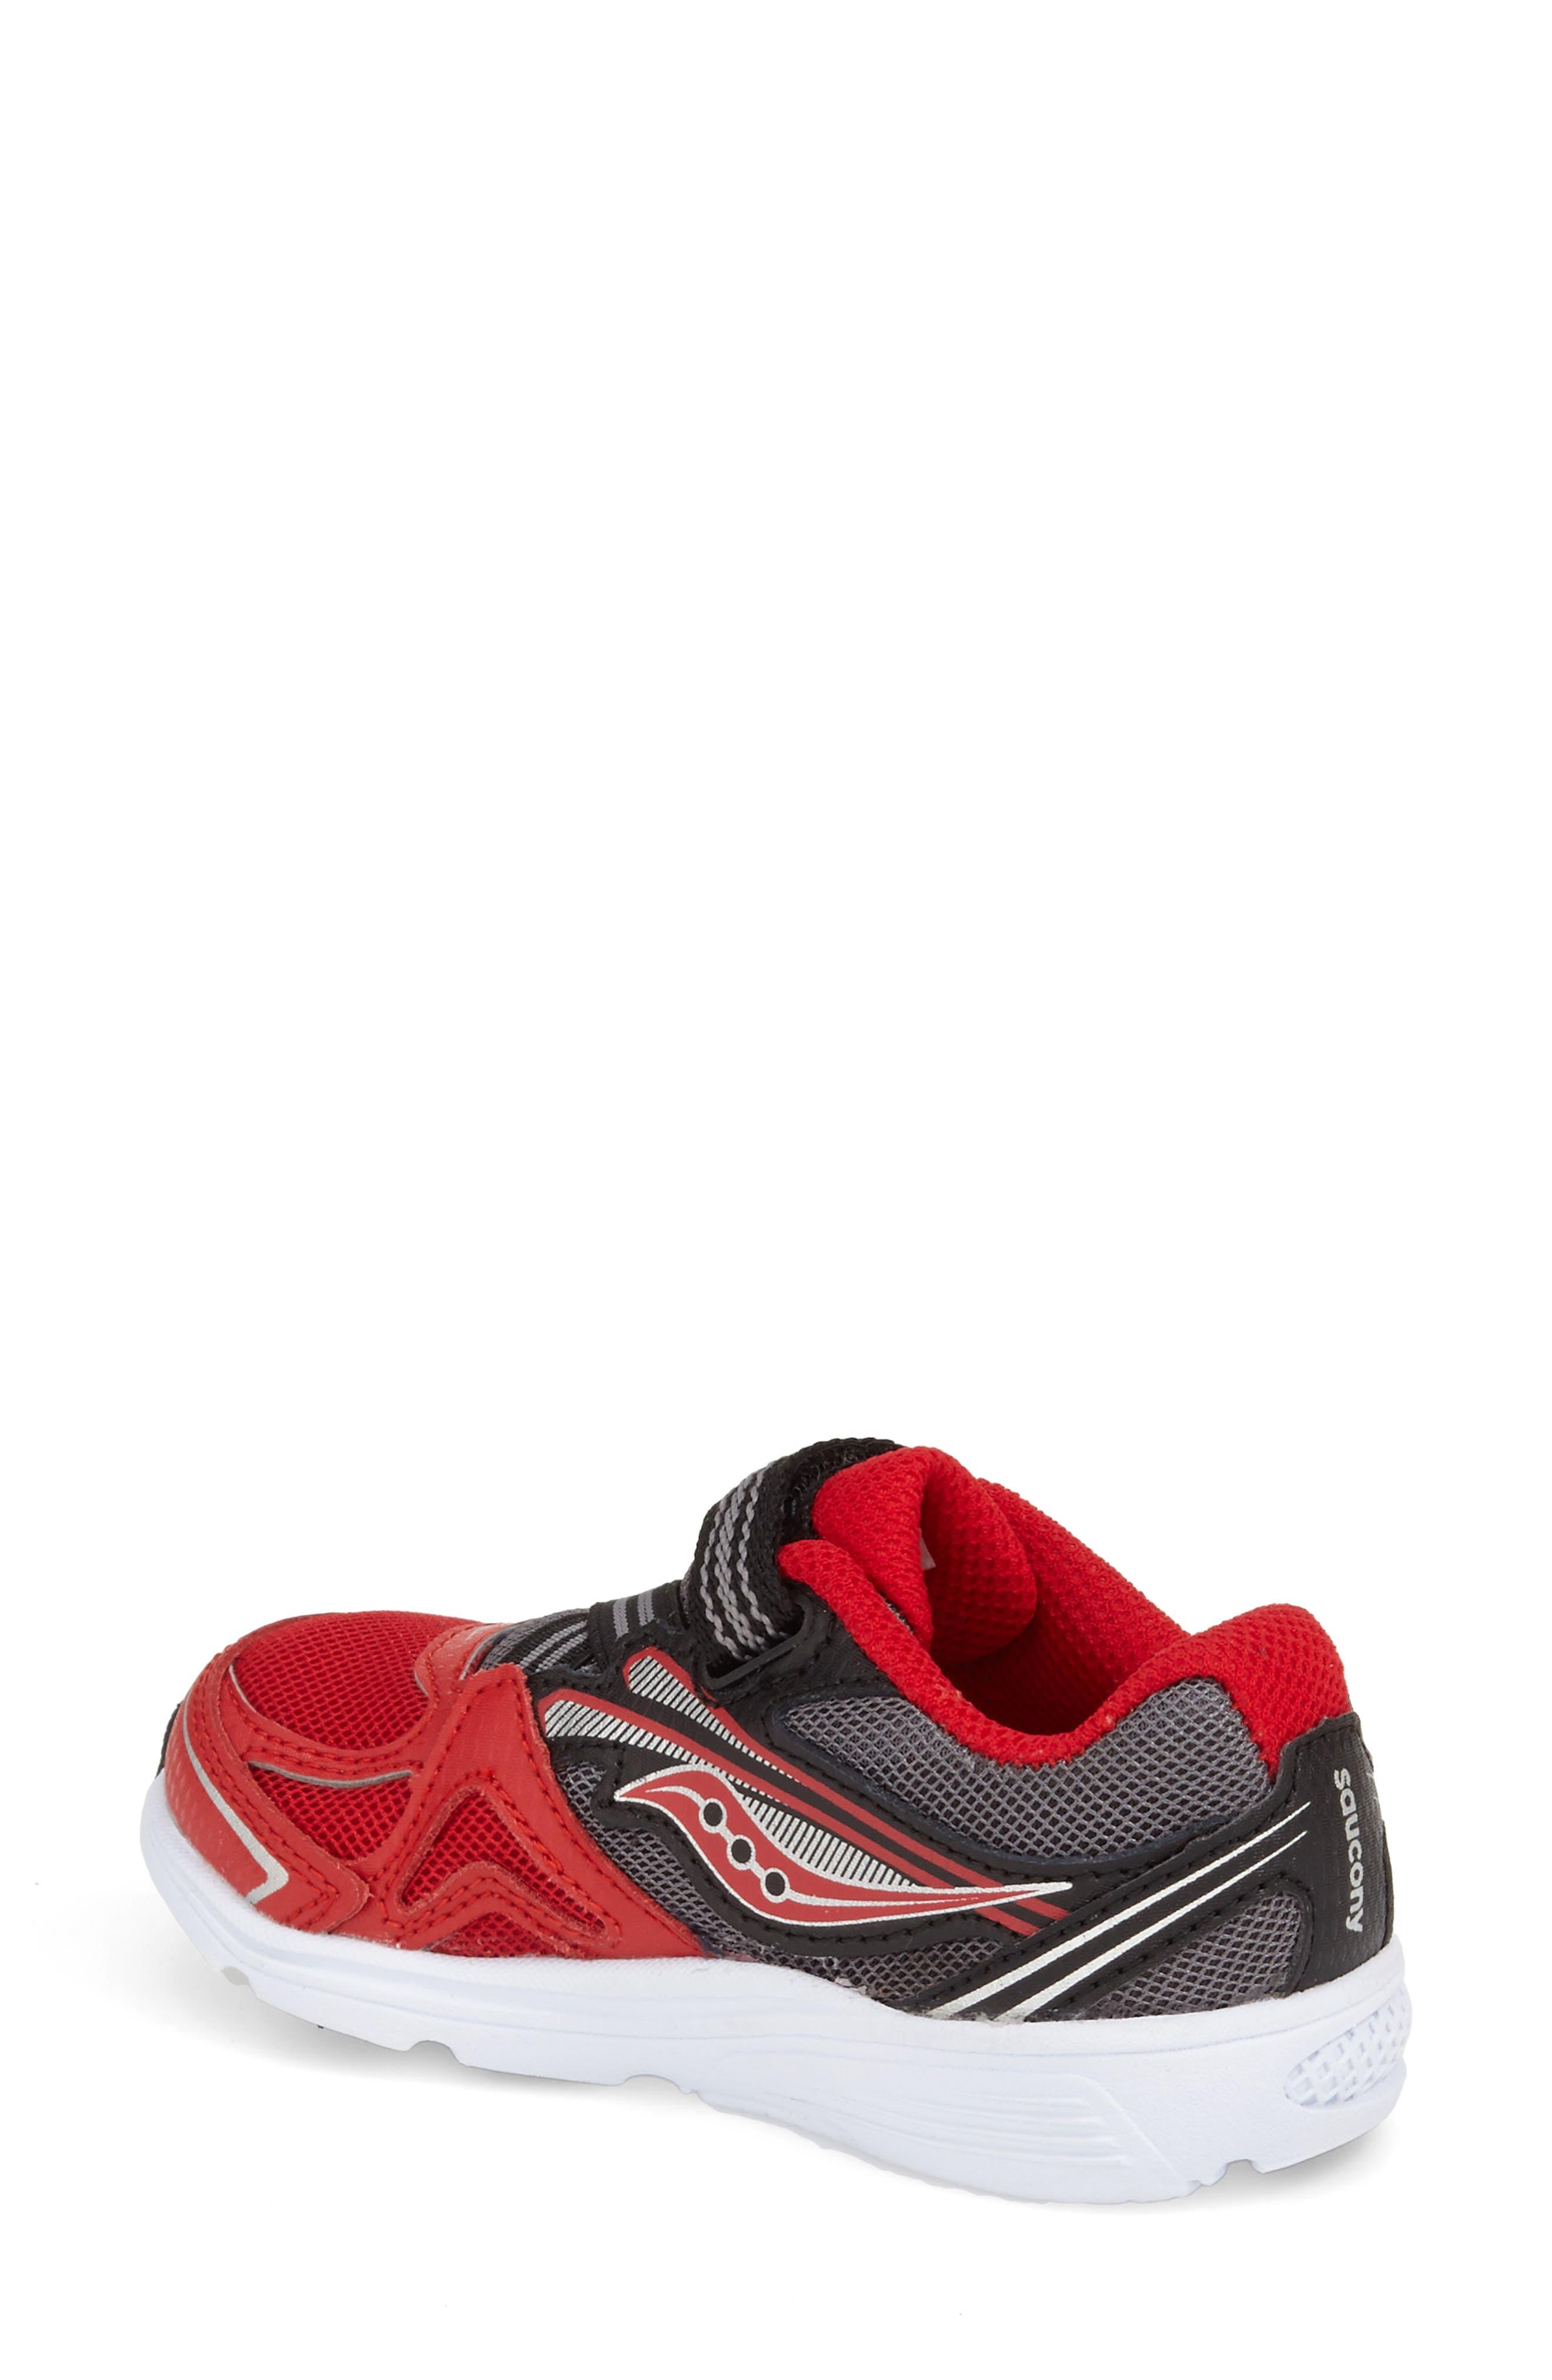 'Ride' Sneaker,                             Alternate thumbnail 18, color,